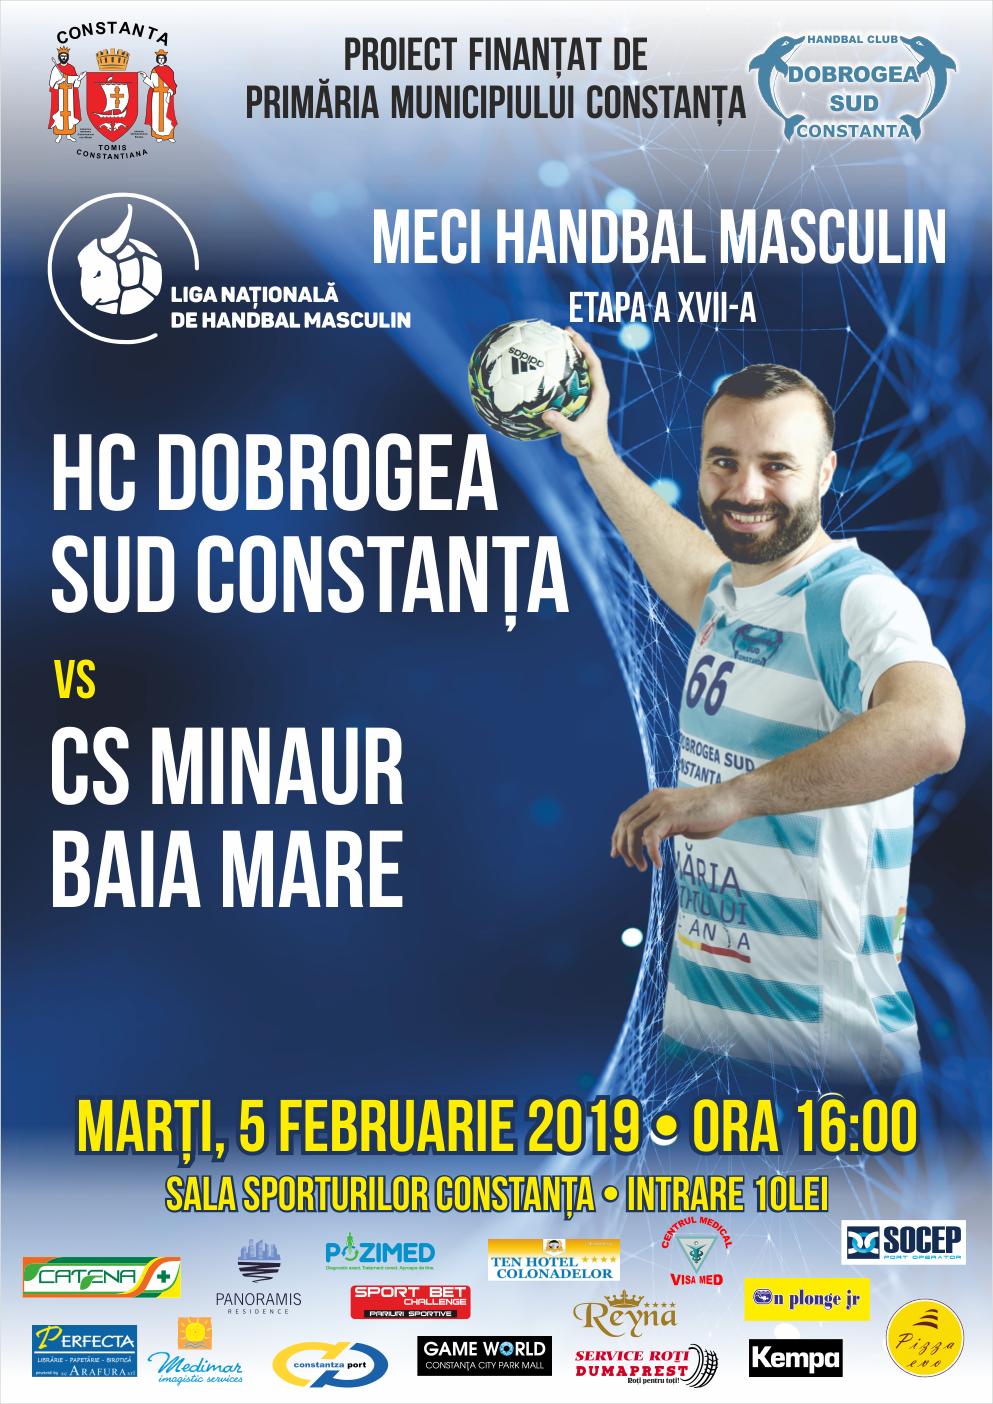 afis HC Dobrogea Sud Constanta vs. CS Minaur Baia Mare 05.02.2019